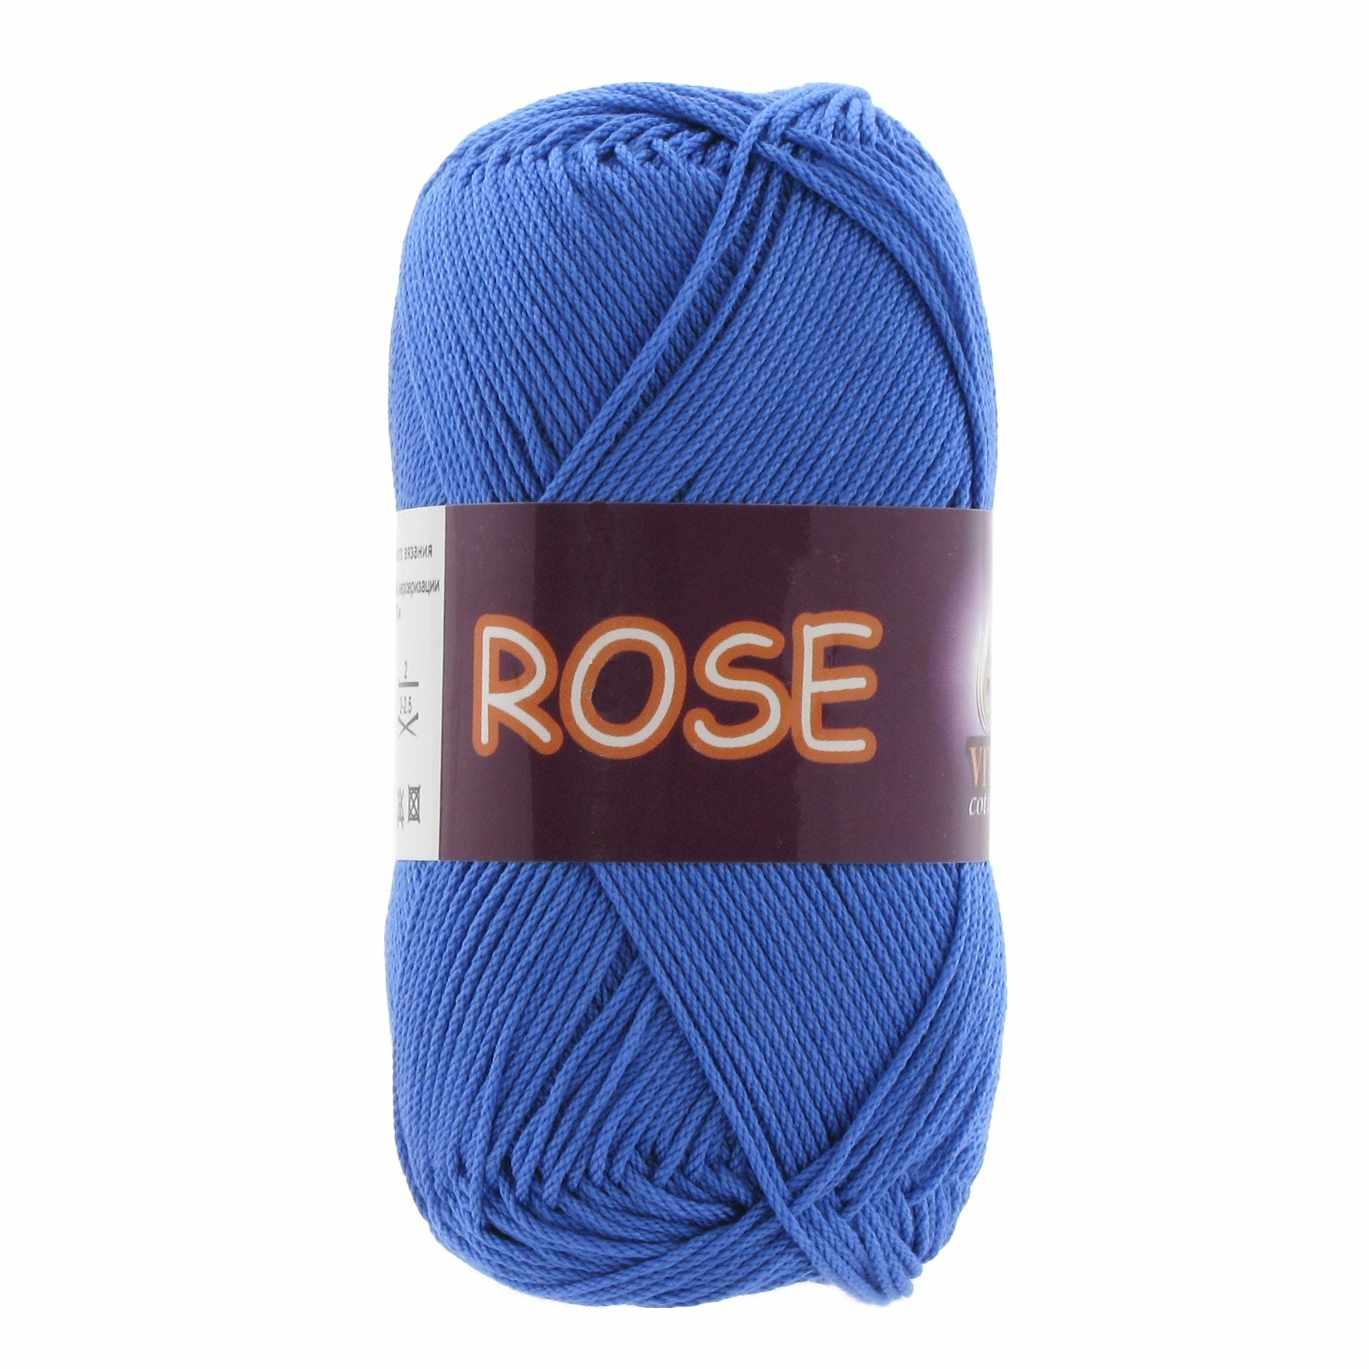 Ярко синяя пряжа шнурок круглый